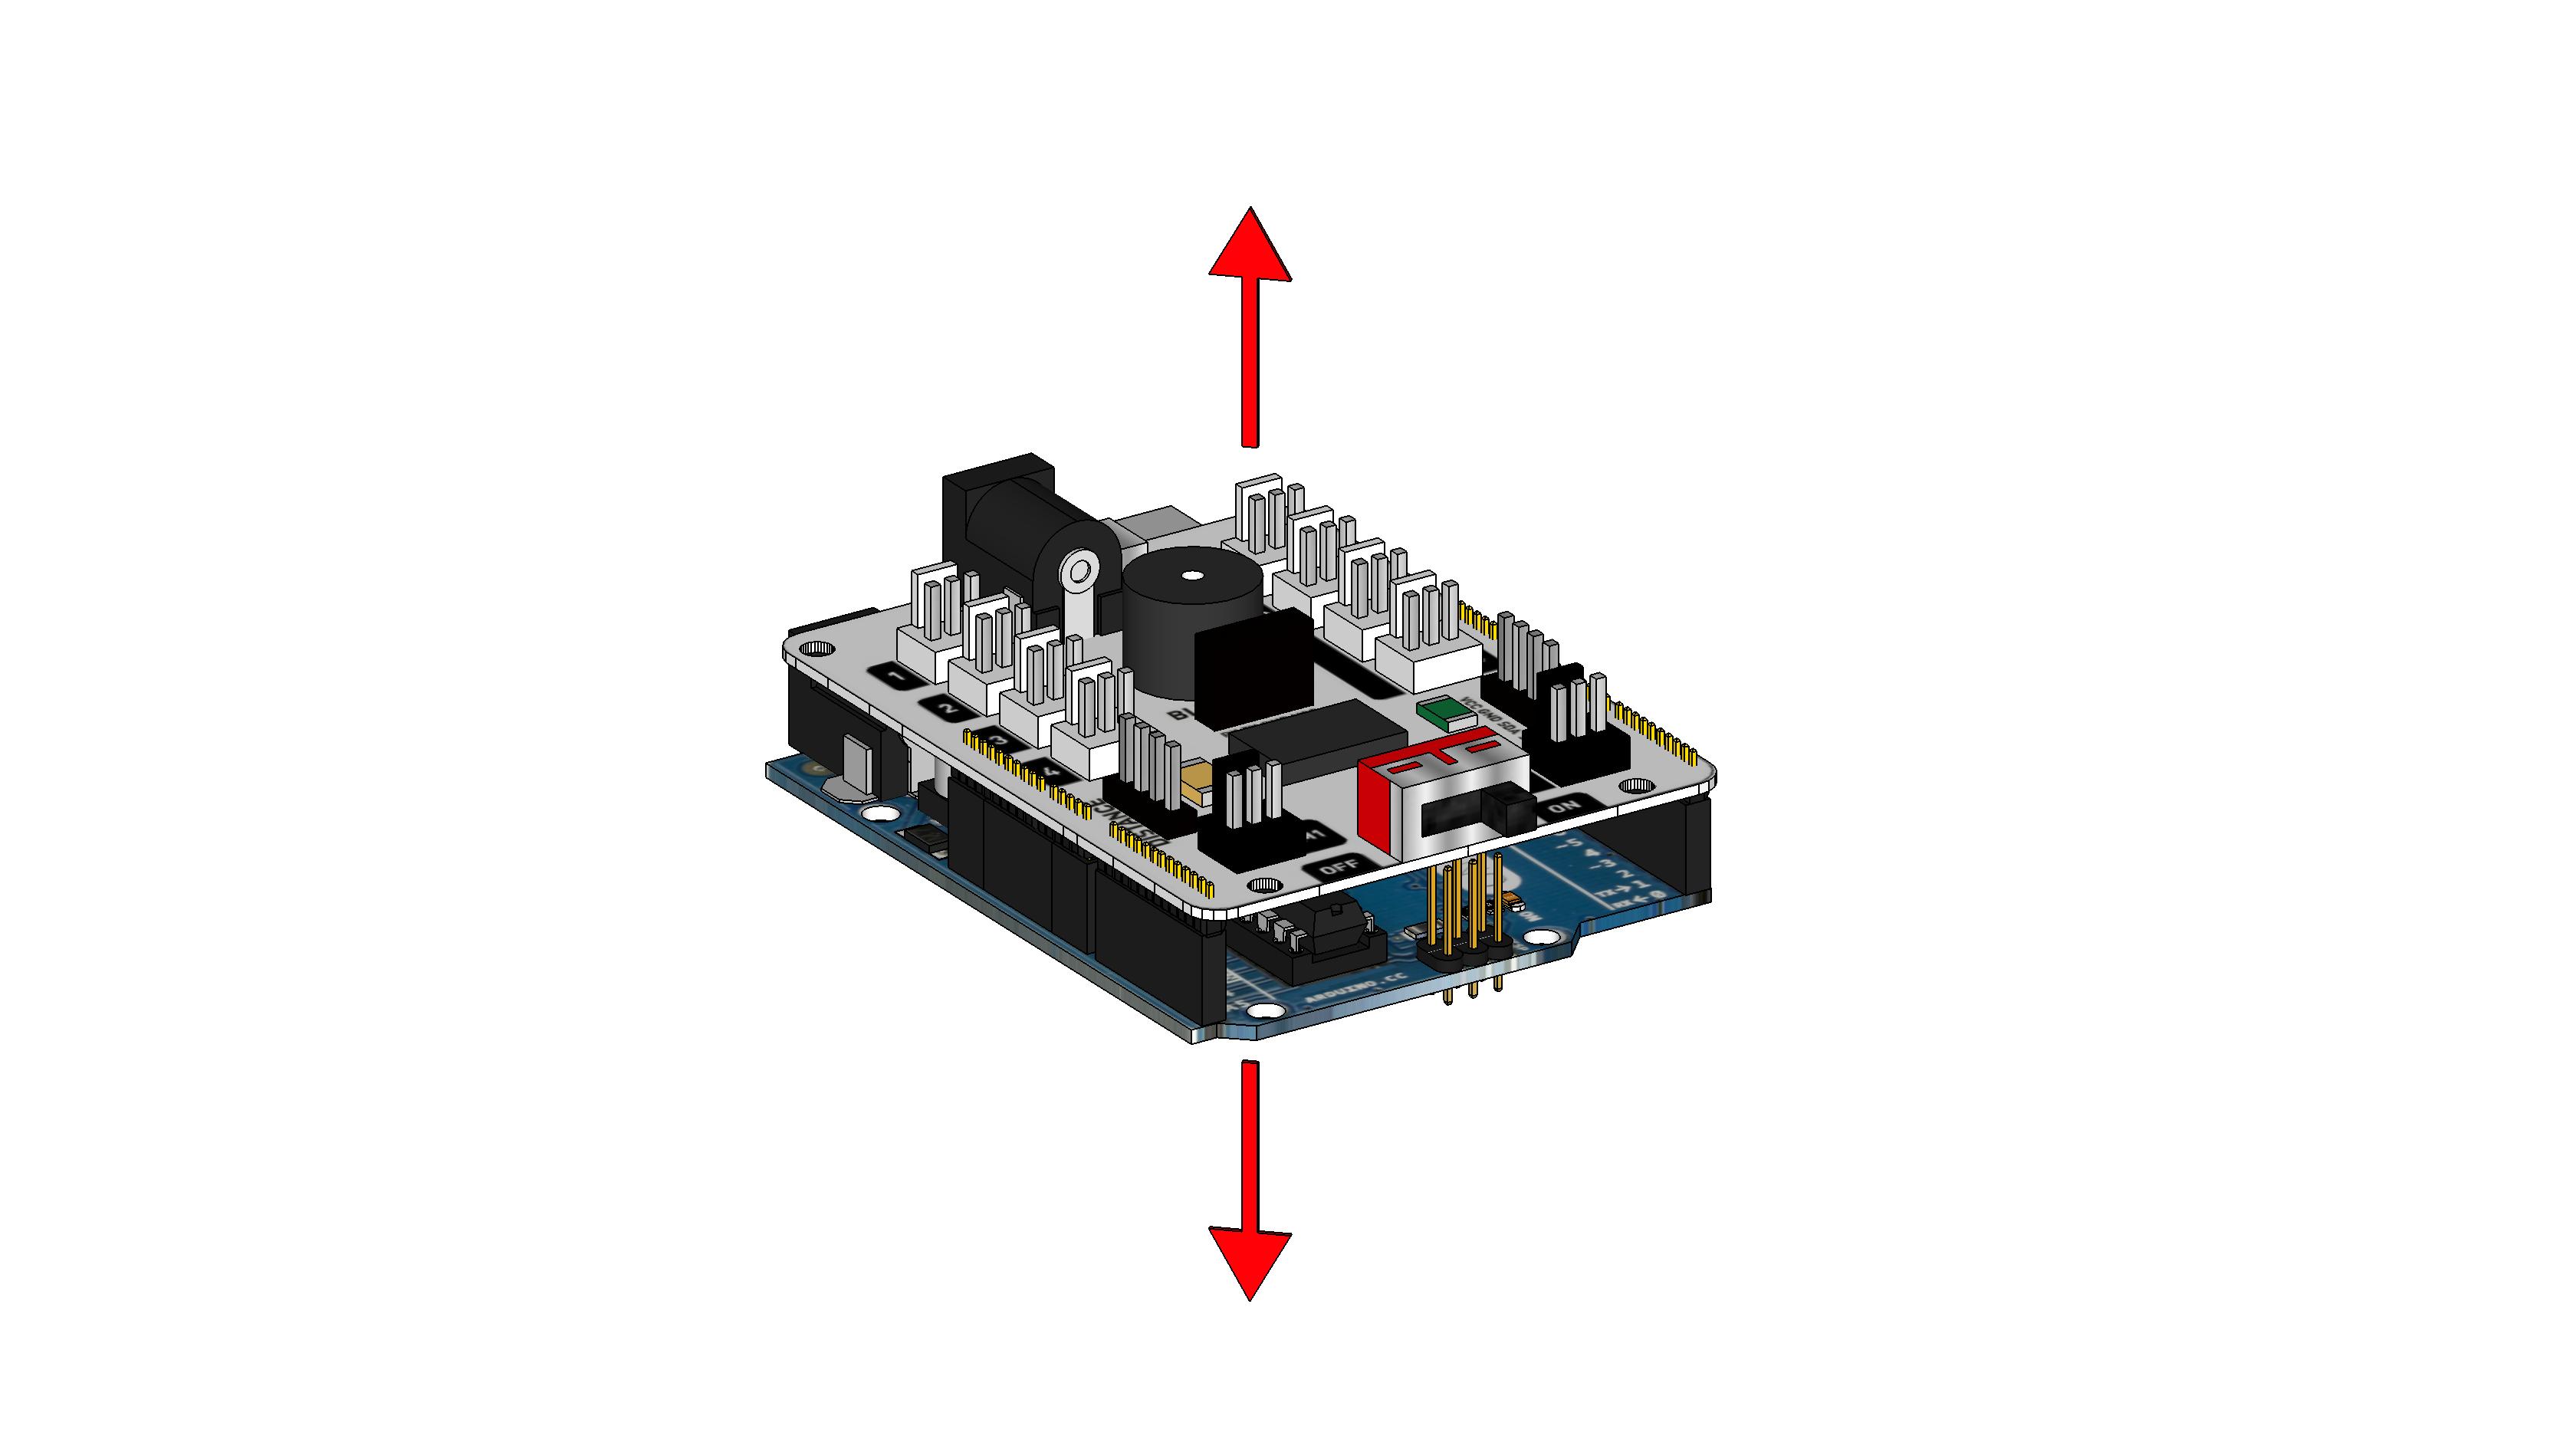 LOFI_Robot_Rover_assembly (21)